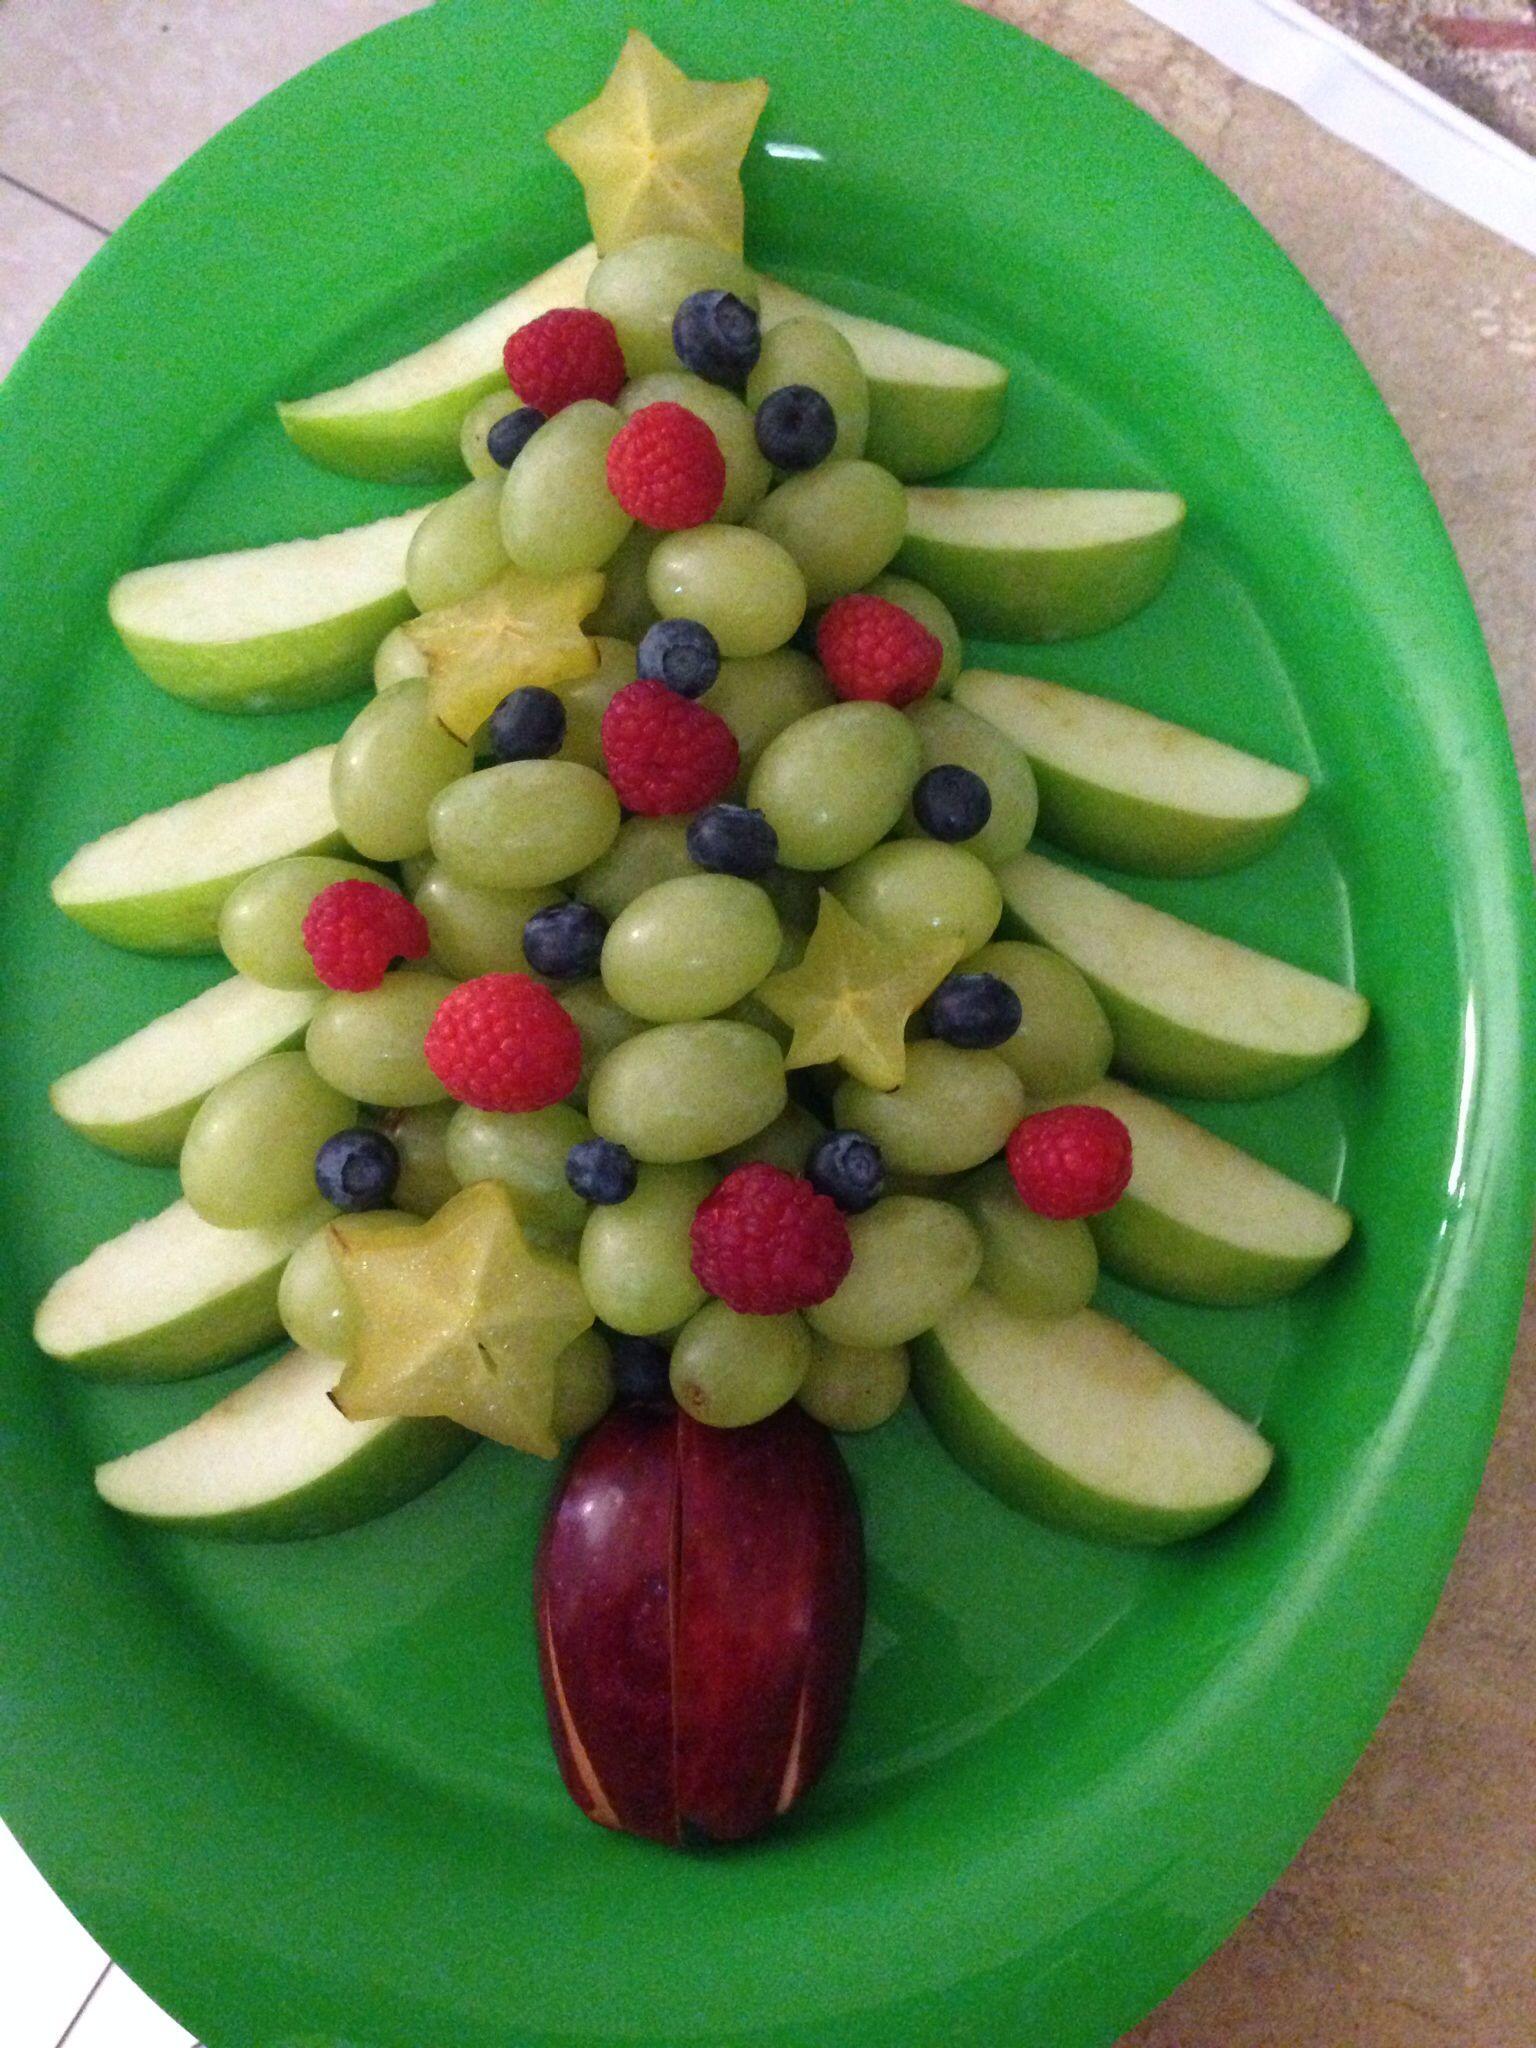 Christmas Tree Fruit Platter.Christmas Tree Fruit Platter Thing S I Have Made Fruit